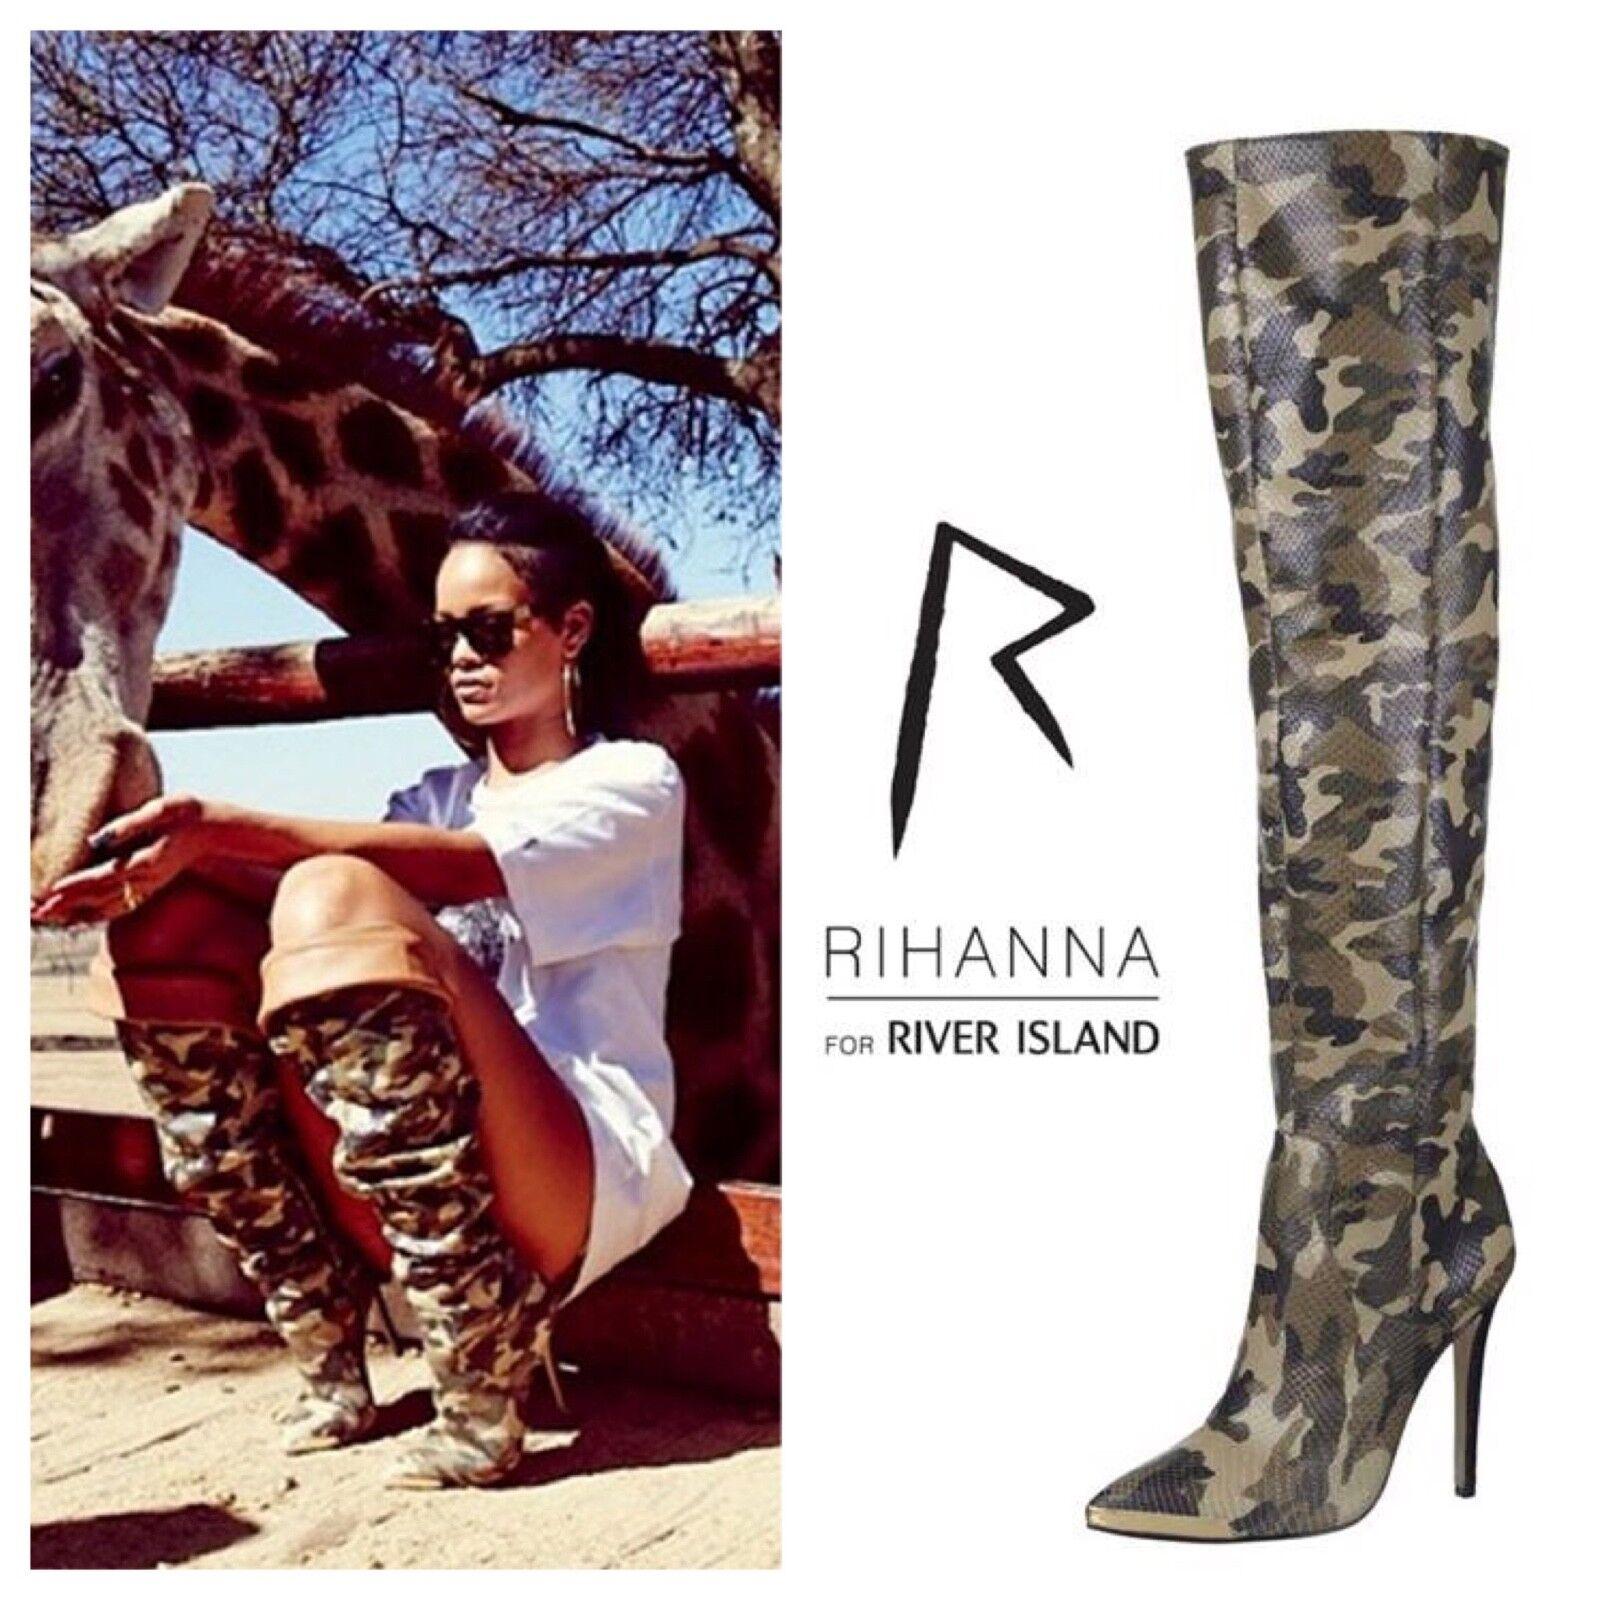 Rihanna Super Raro River Island Caqui Camo la señaló Stiletto la Camo rodilla botas altas 38 b02c78